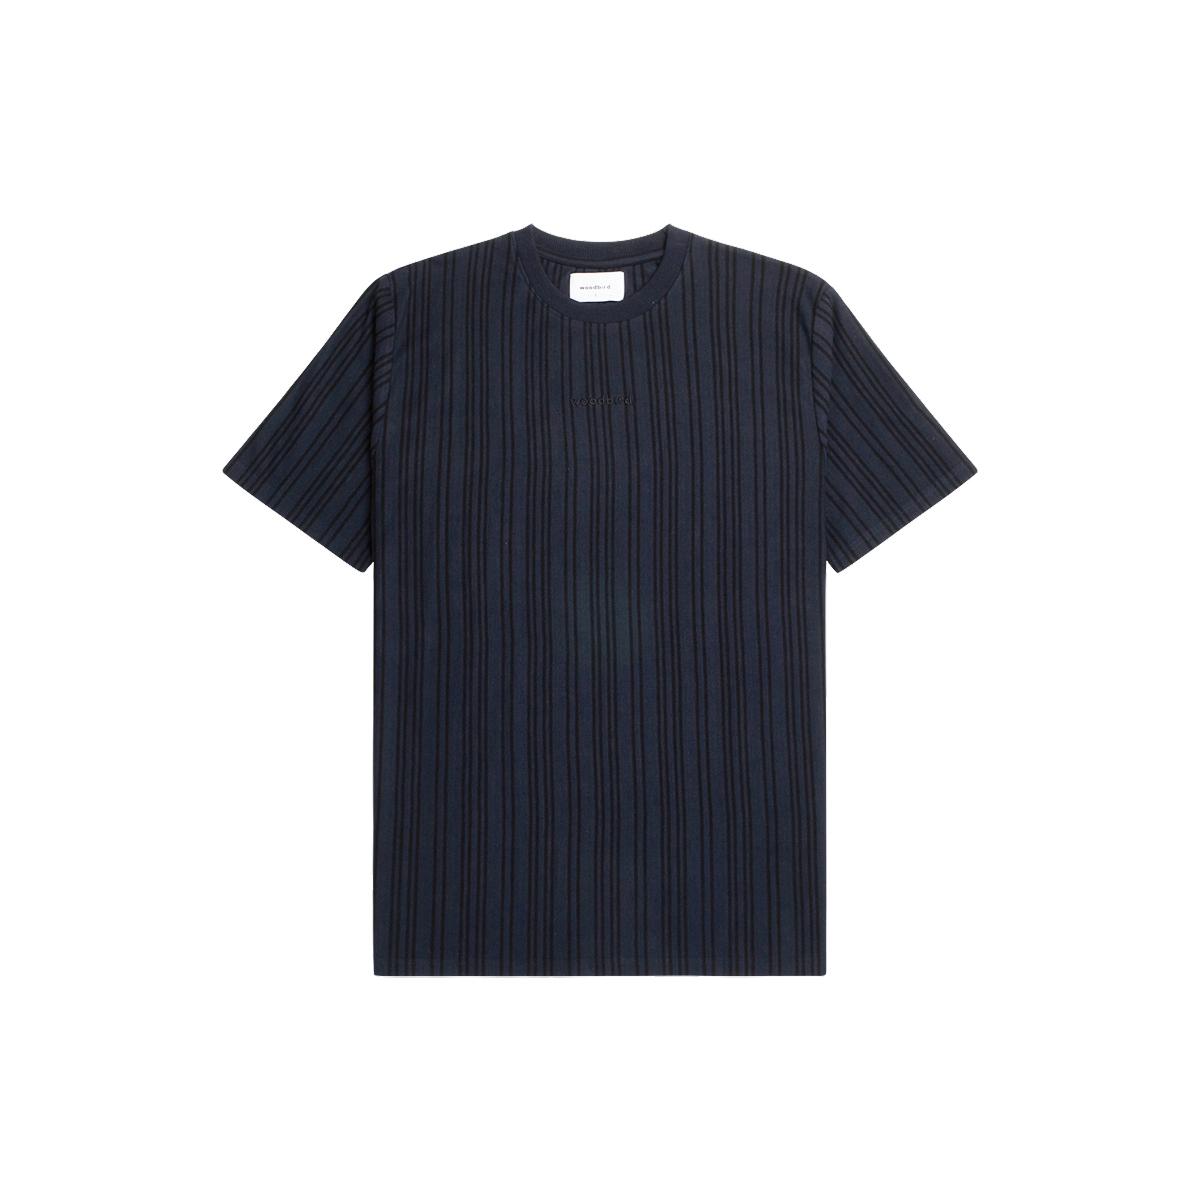 Woodbird Braws Pique T-shirt, Navy Black, M